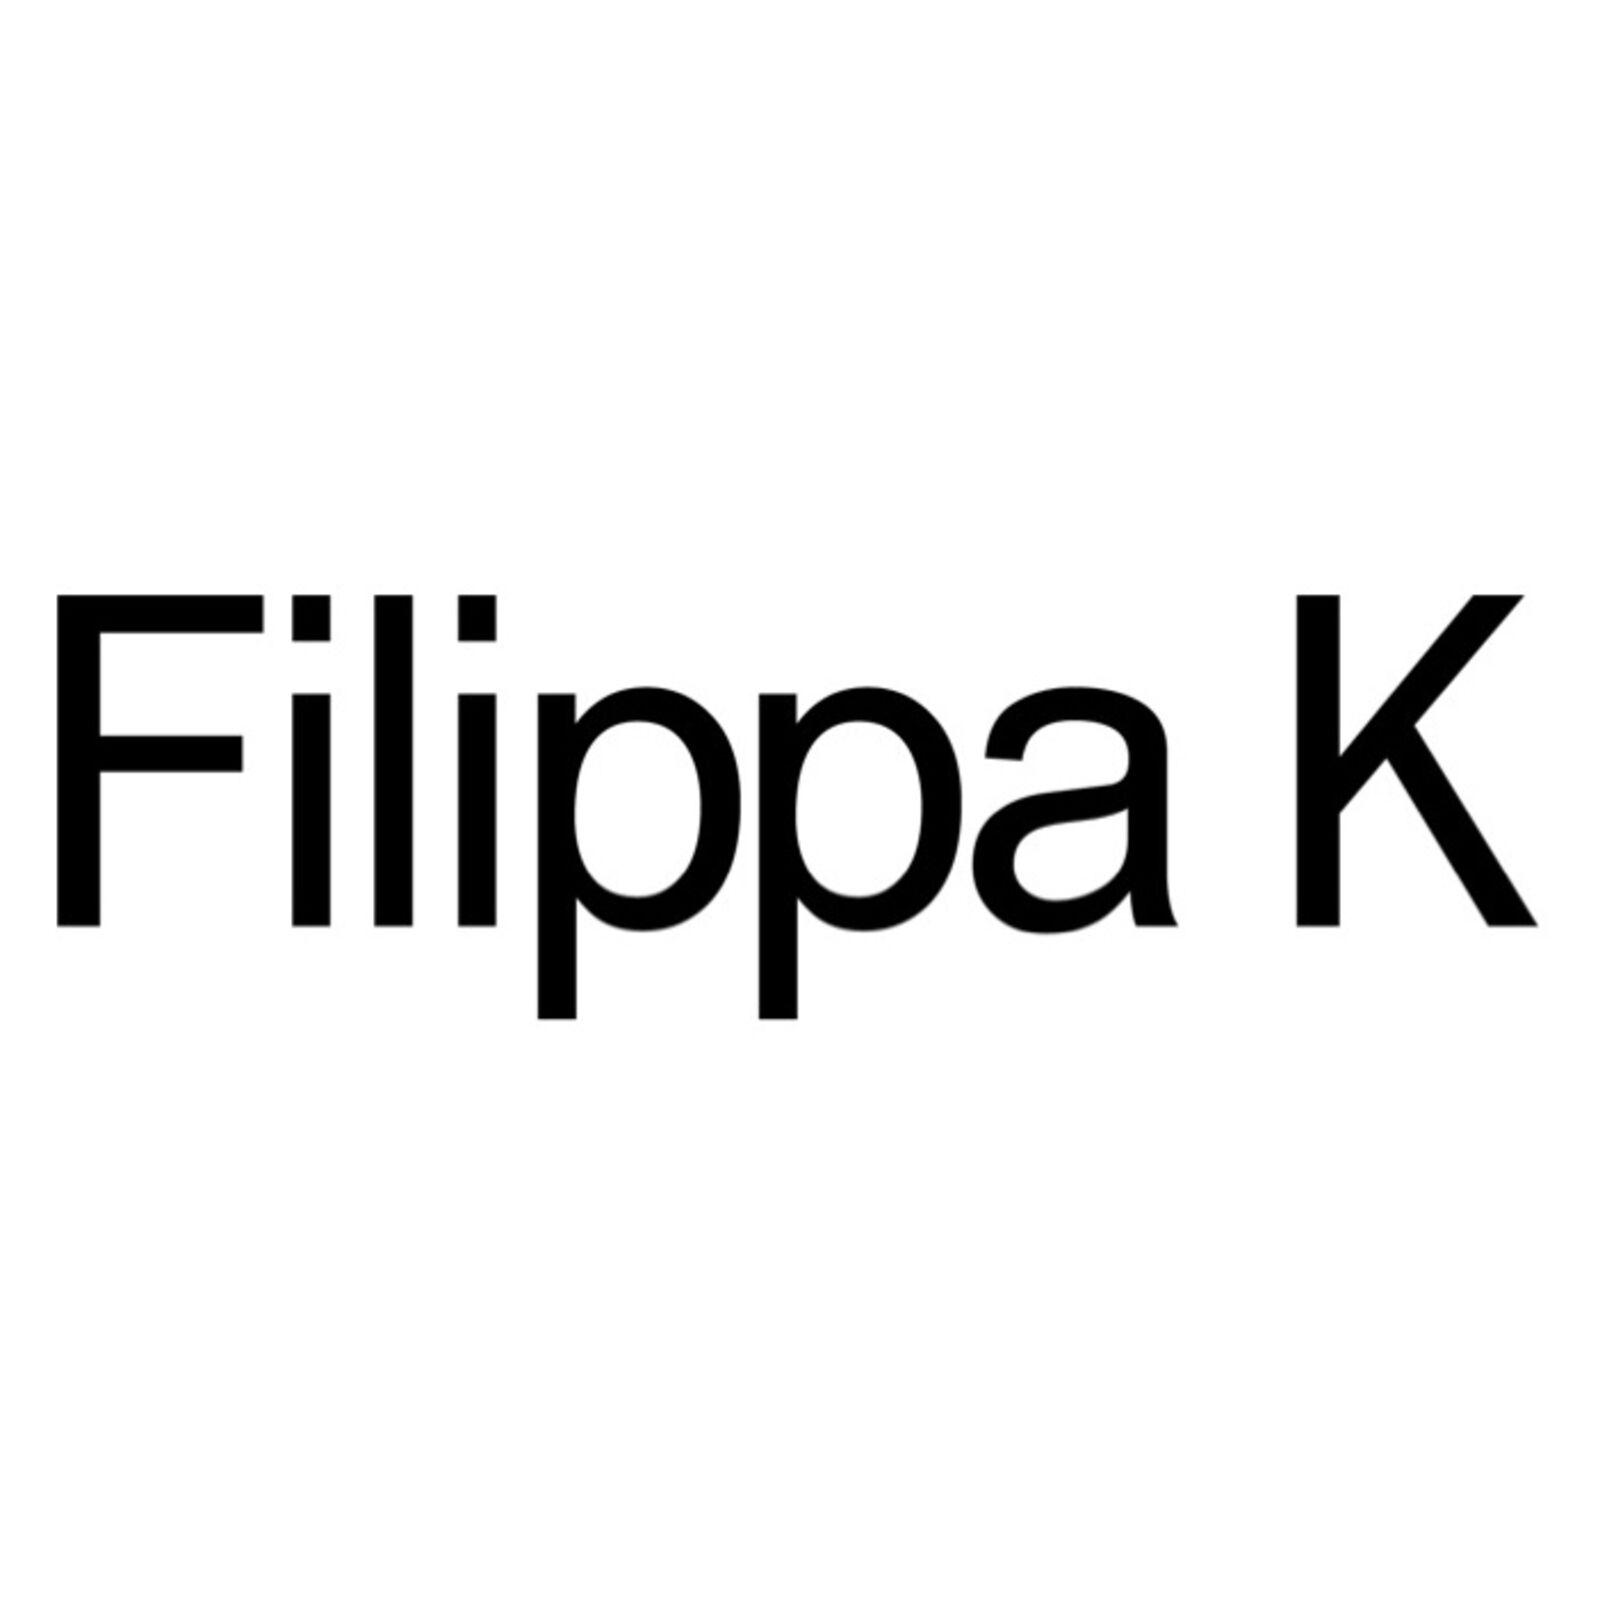 Filippa K (Bild 1)